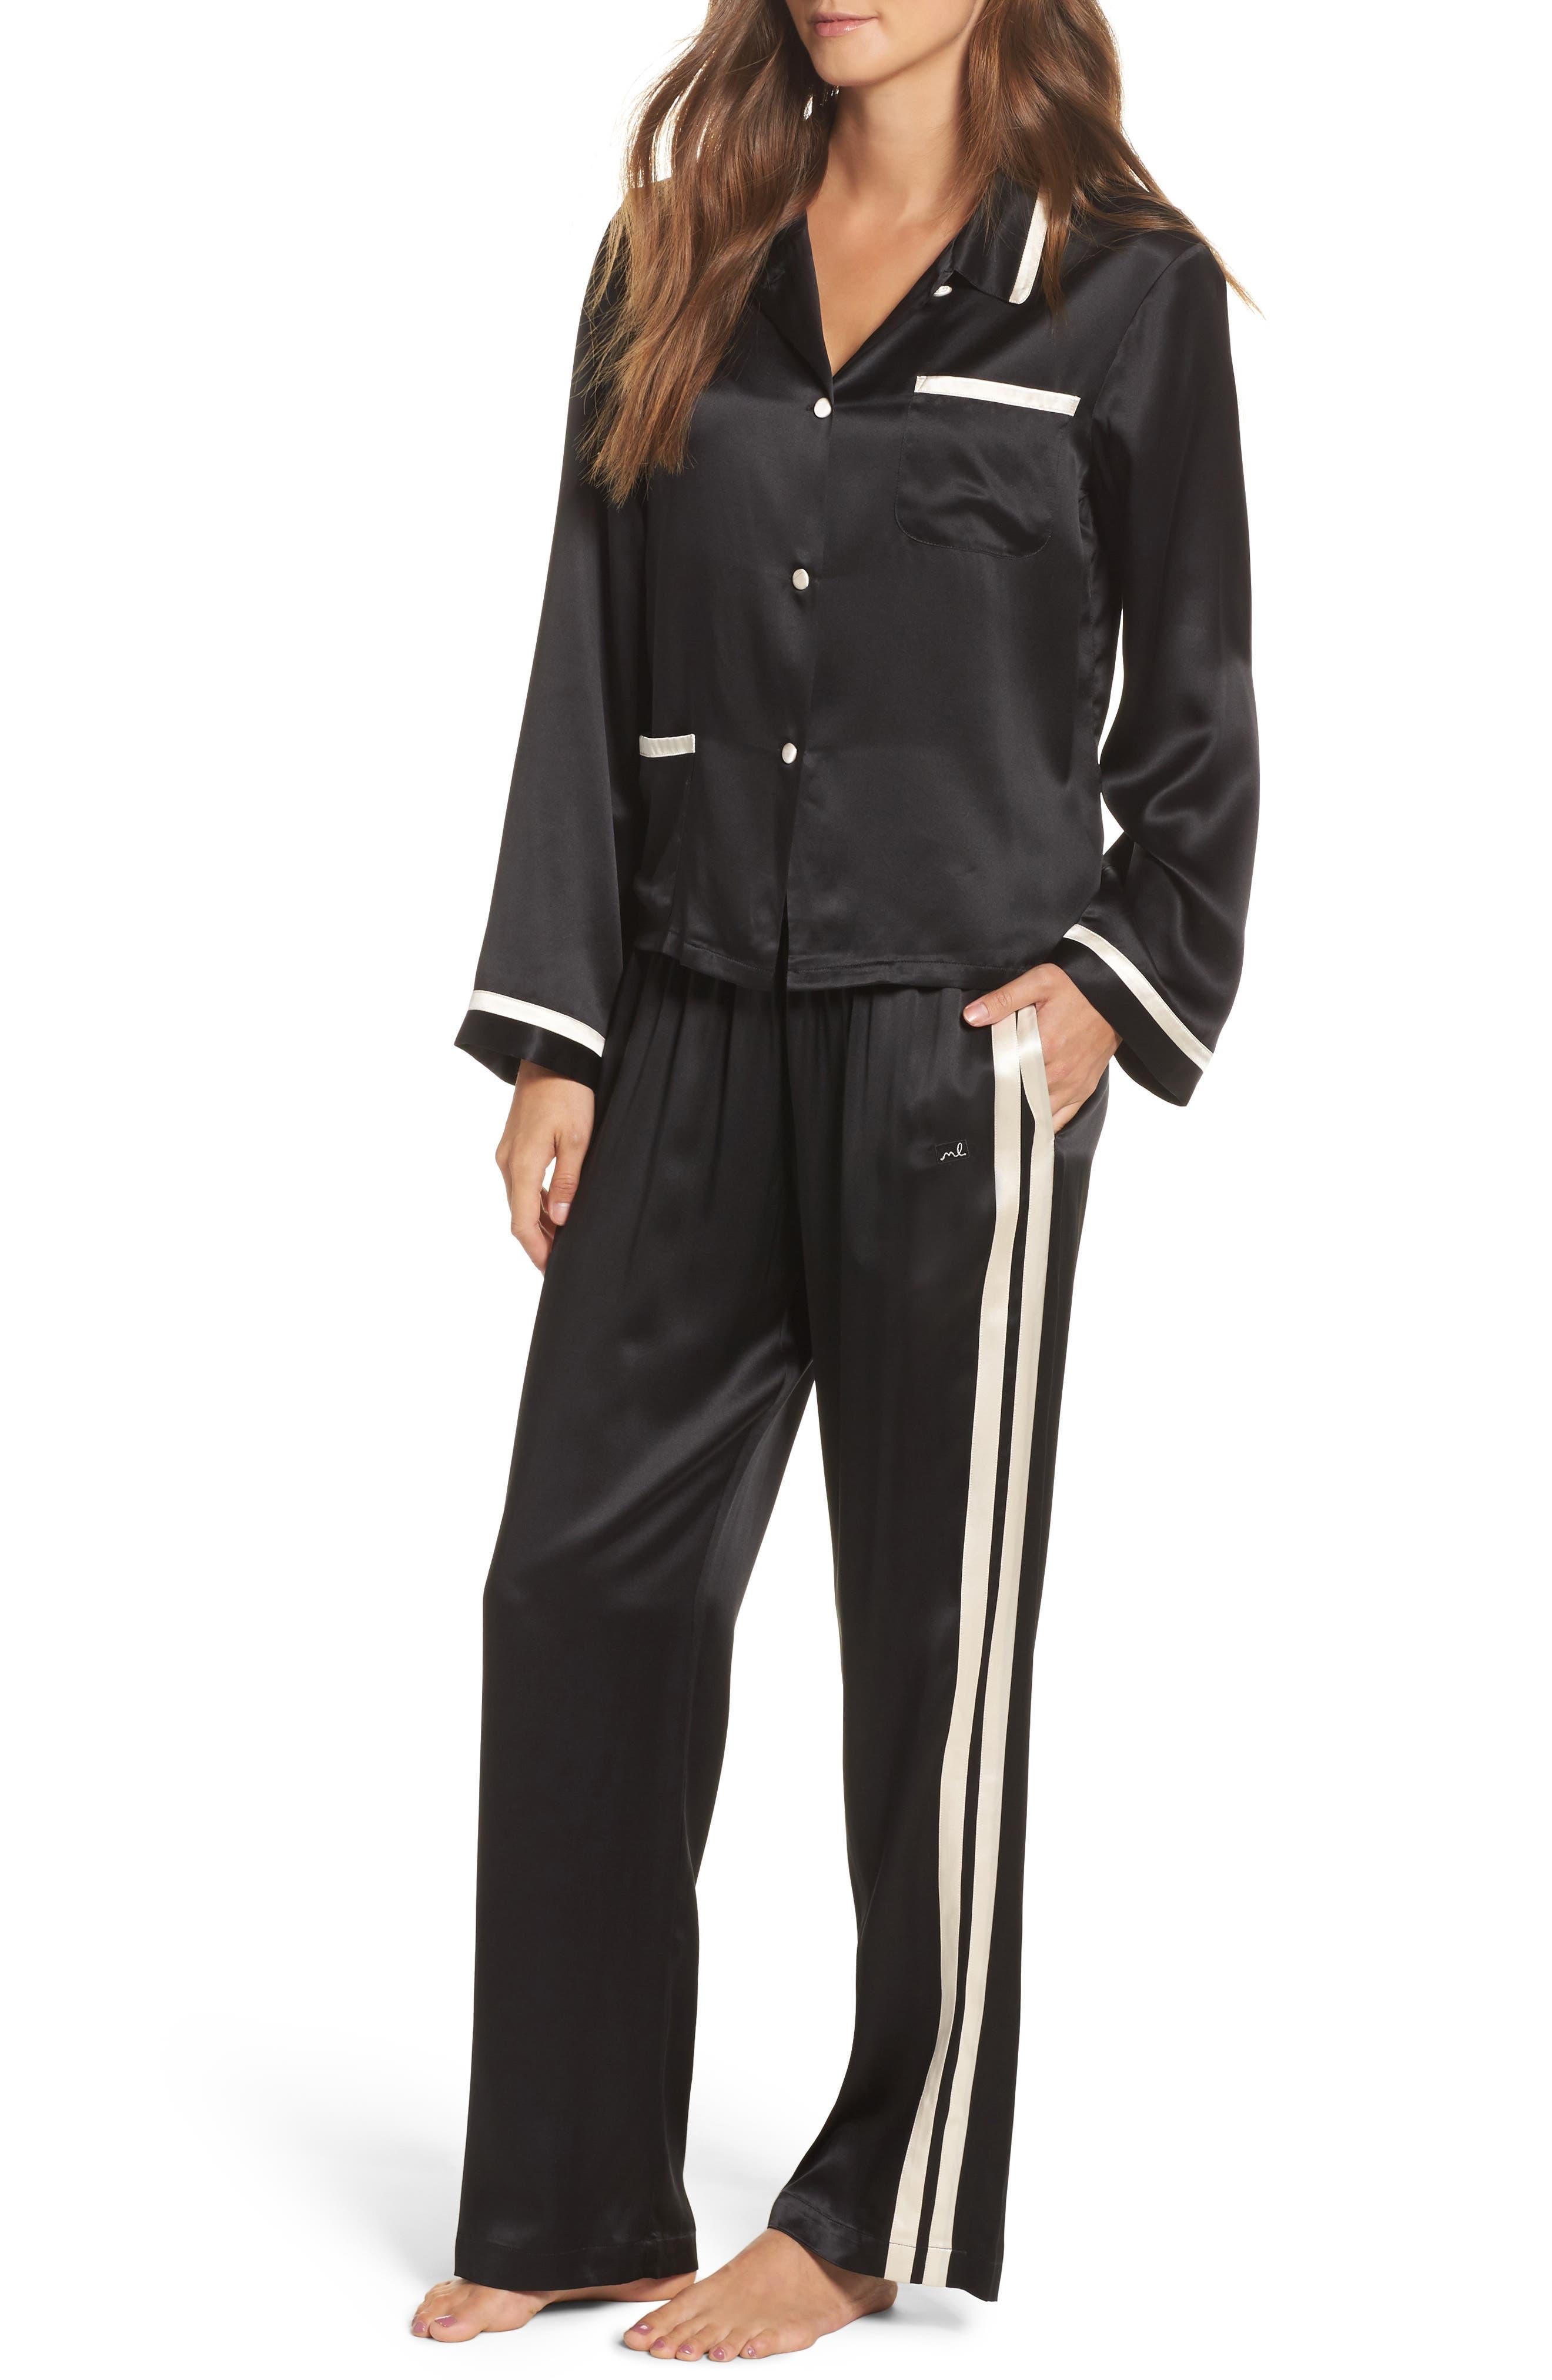 Ruthie Silk Charmeuse Pajama Top,                             Alternate thumbnail 7, color,                             003